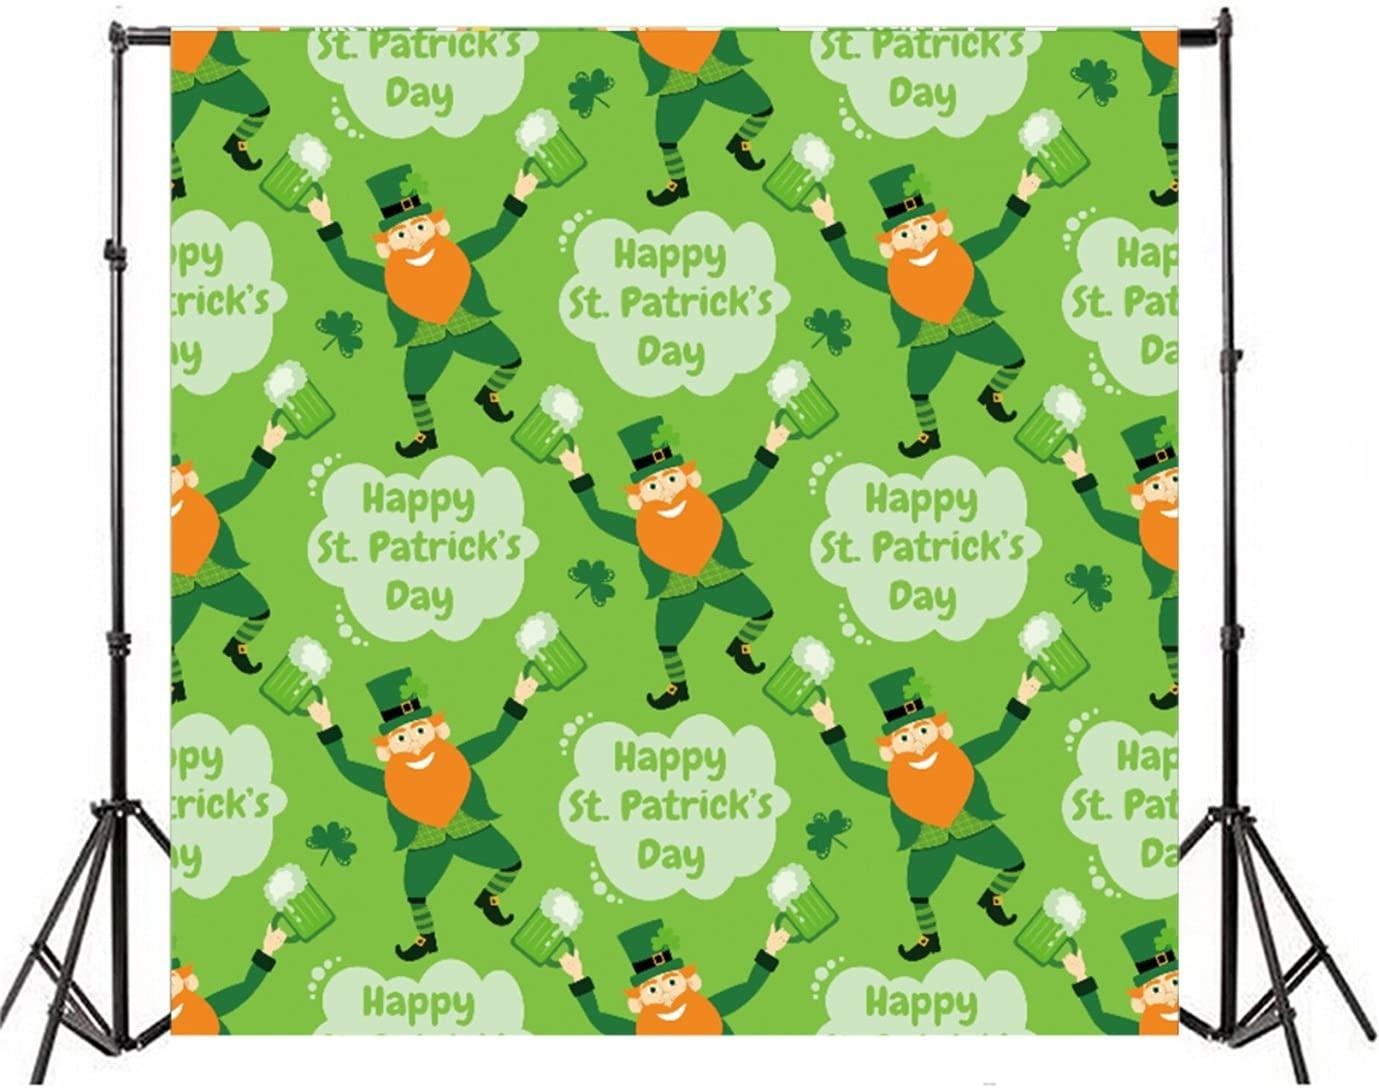 Leyiyi 6x6ft Photography Background Happy St. Patrick's Day Backdrop Lucky Greenery Clover Leprechauns Hat Sheperd Beer Cheer March 17th Spring Holiday Shamrocks Irish Photo Portrait Vinyl Studio Prop